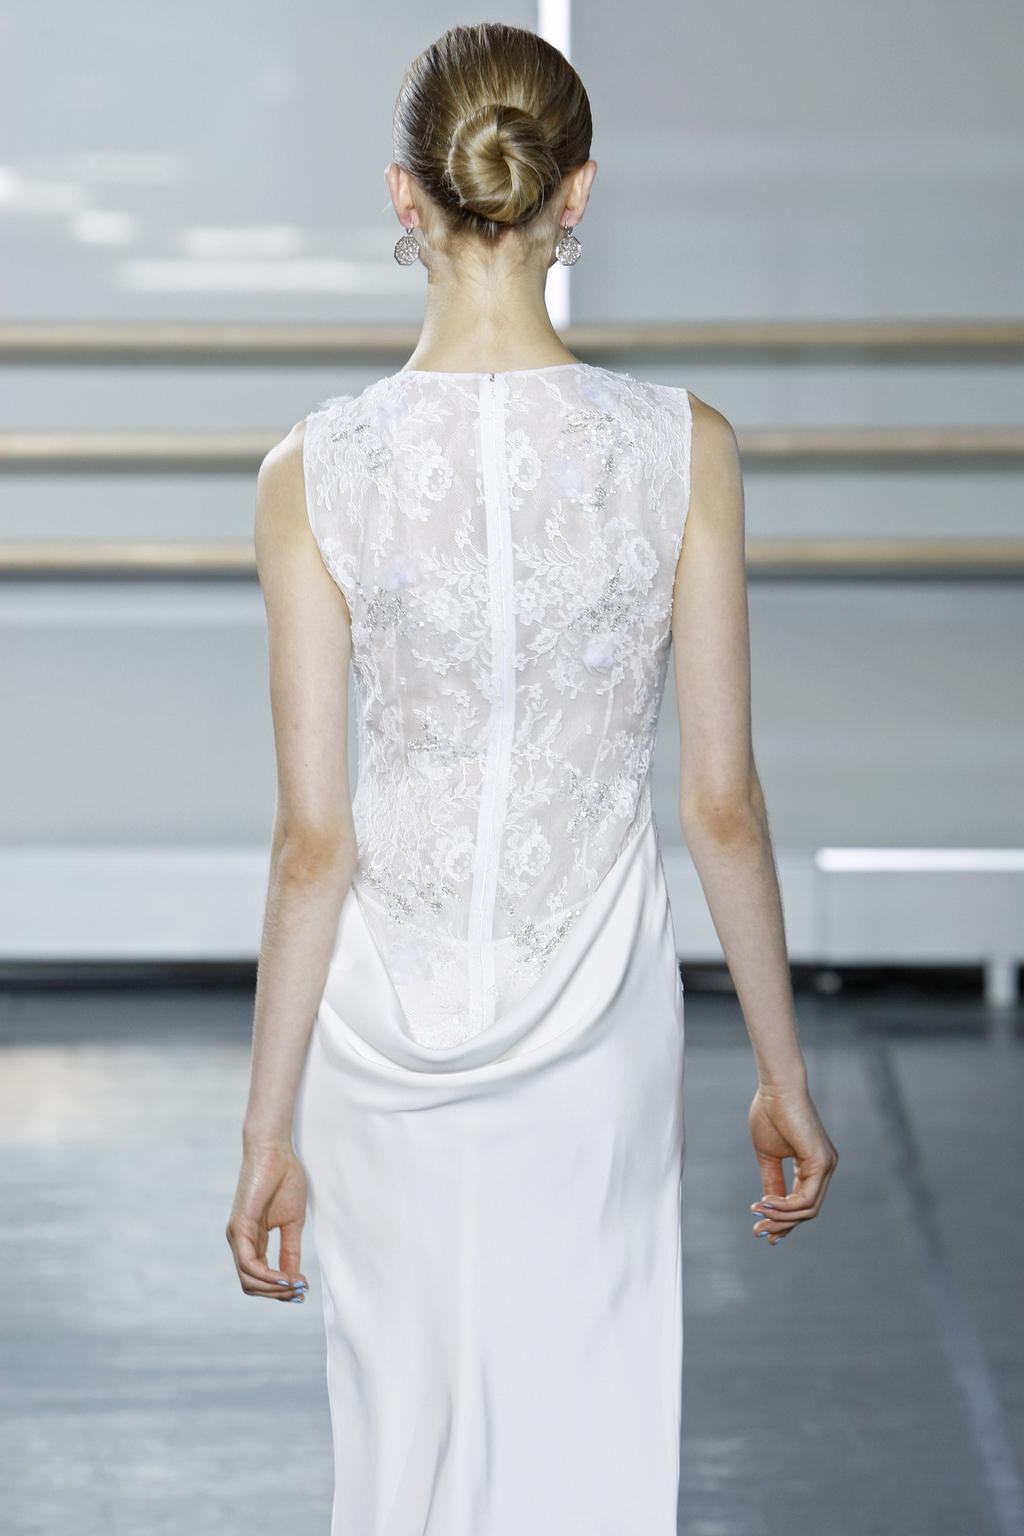 Rivini-wedding-dress-fall-2013-bridal-gown-natalya-back.full